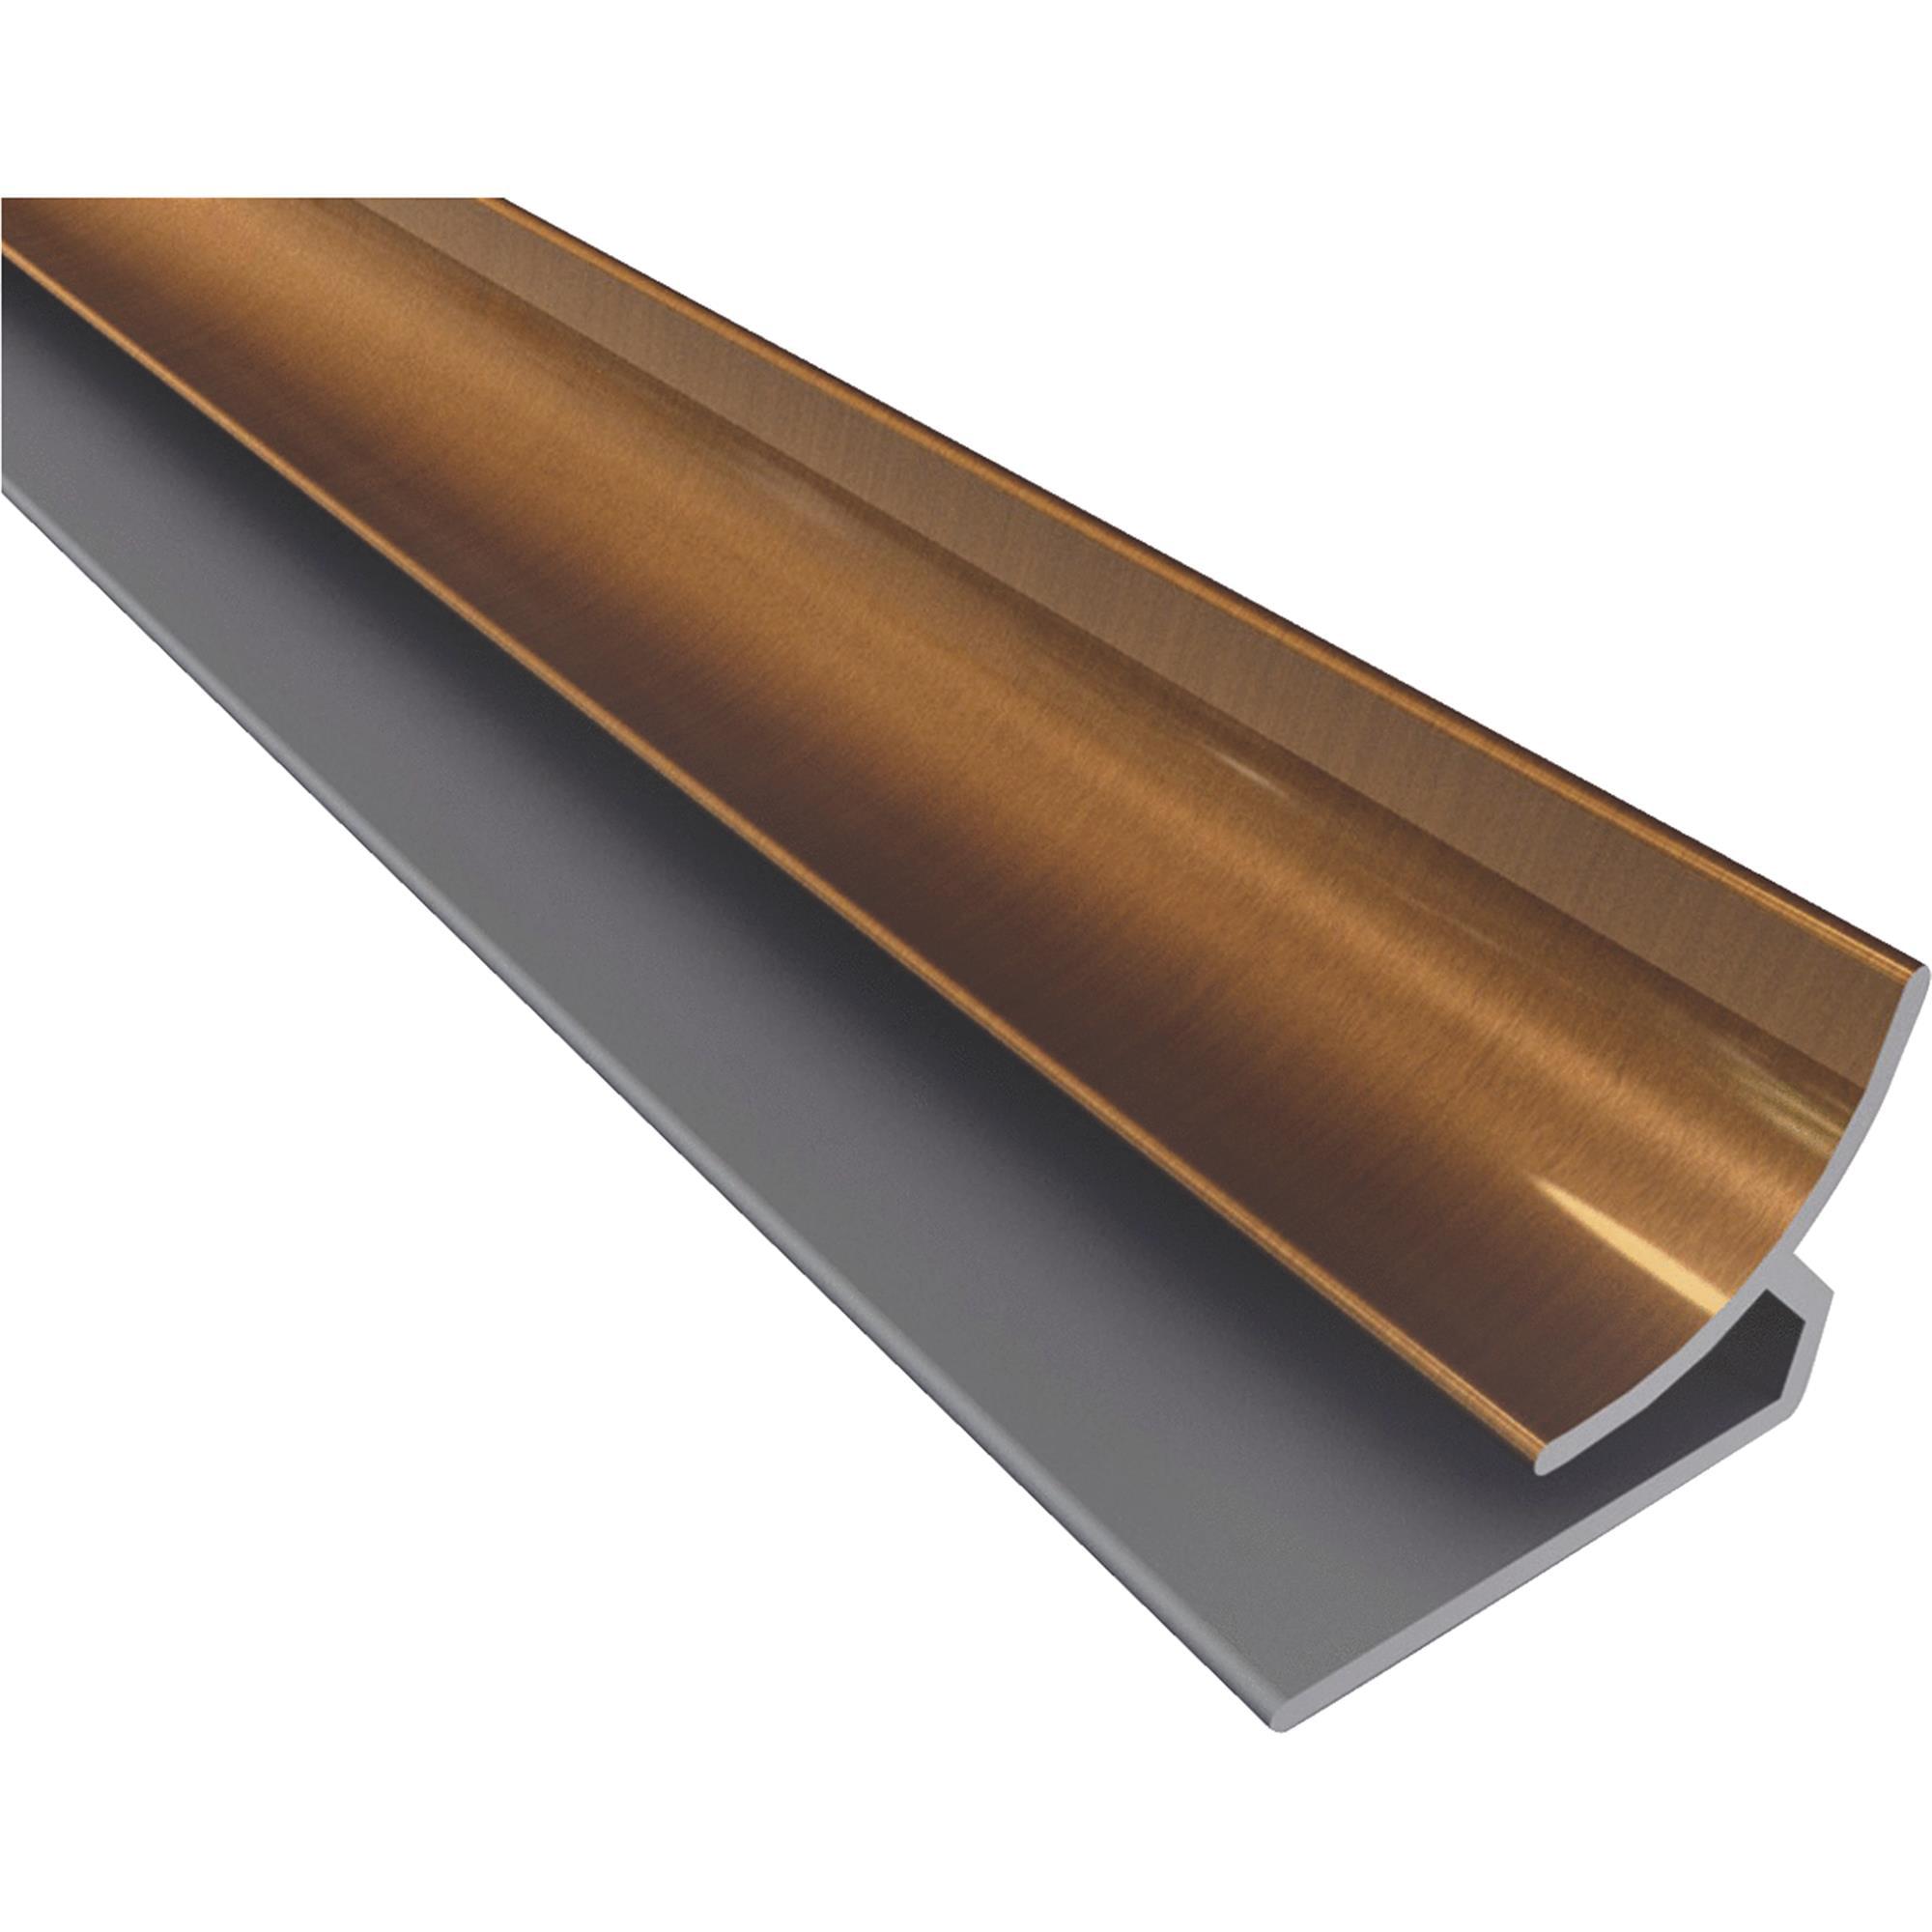 Image of ACP Oil-Rubbed Bronze Inside Backsplash Corner Trim